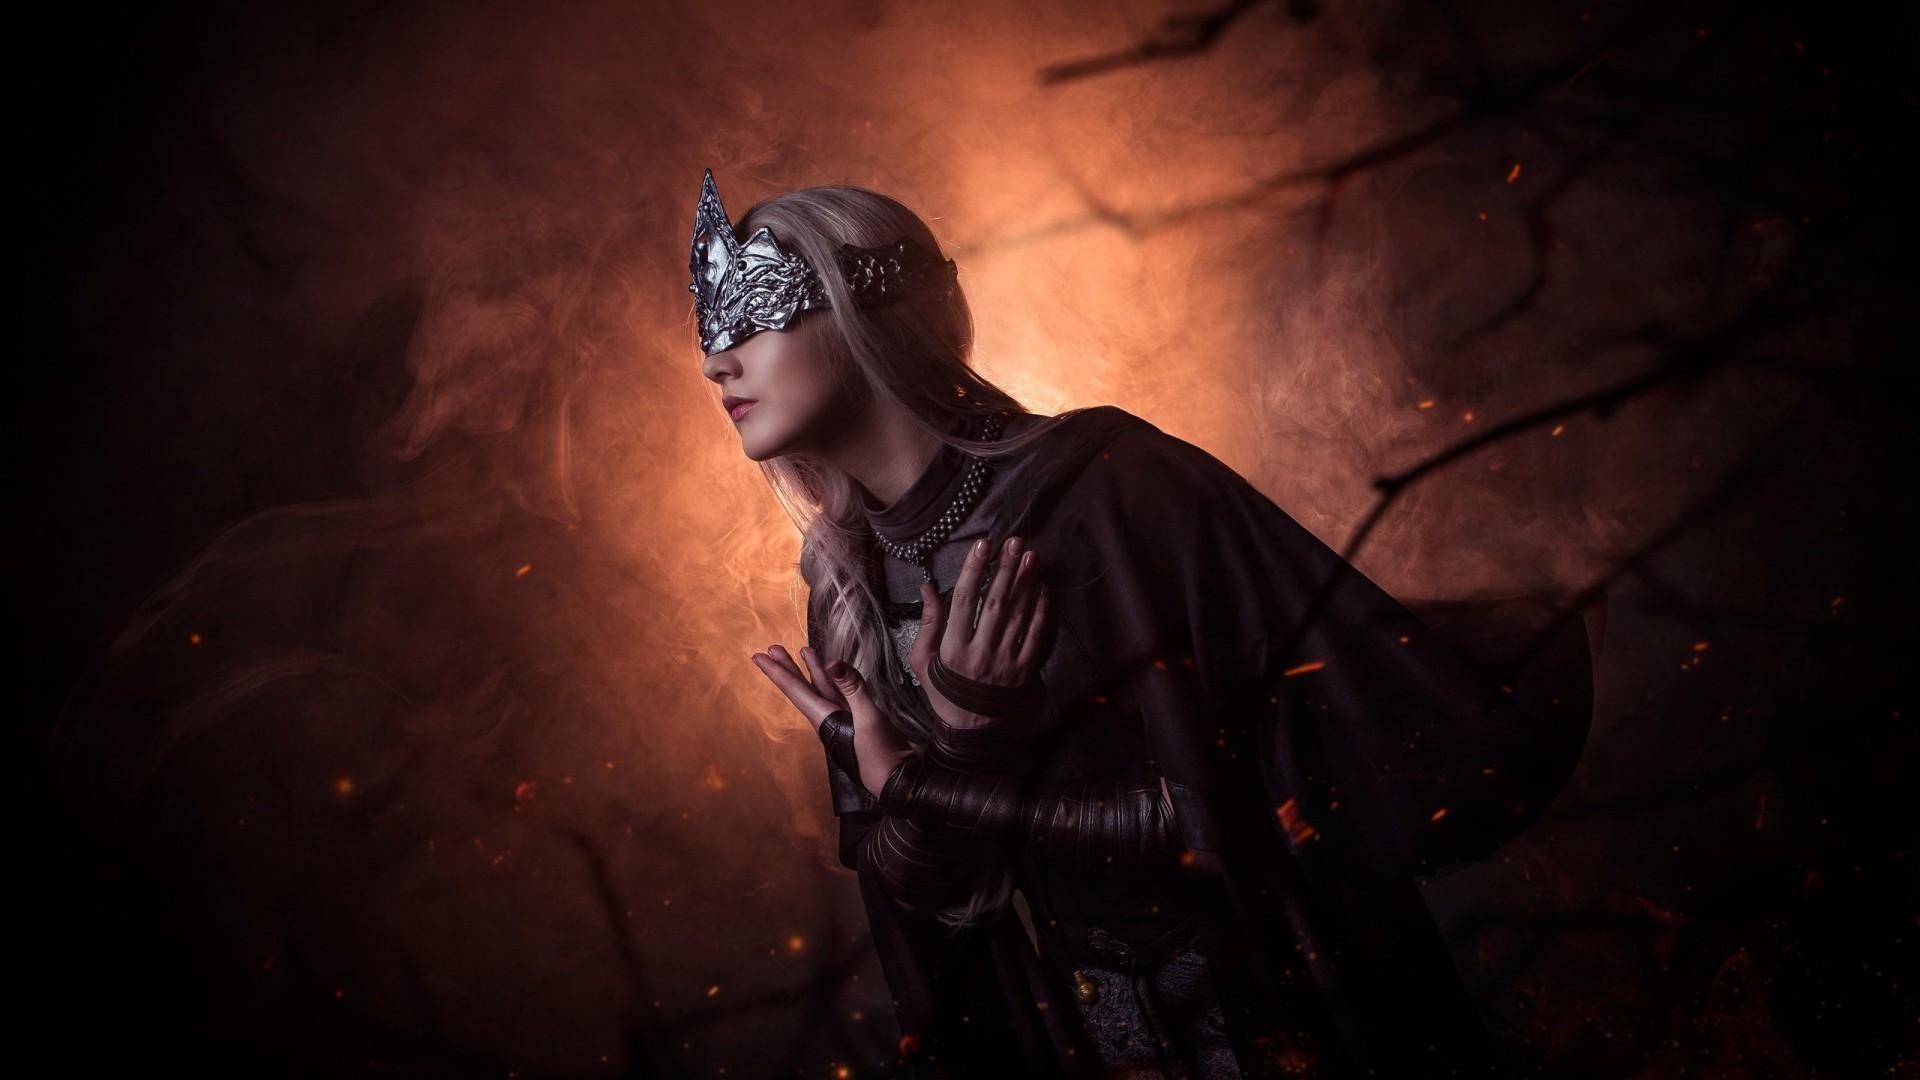 Wallpaper Fire keeper, Cosplay, Dark Souls 3, Fantasy, #934